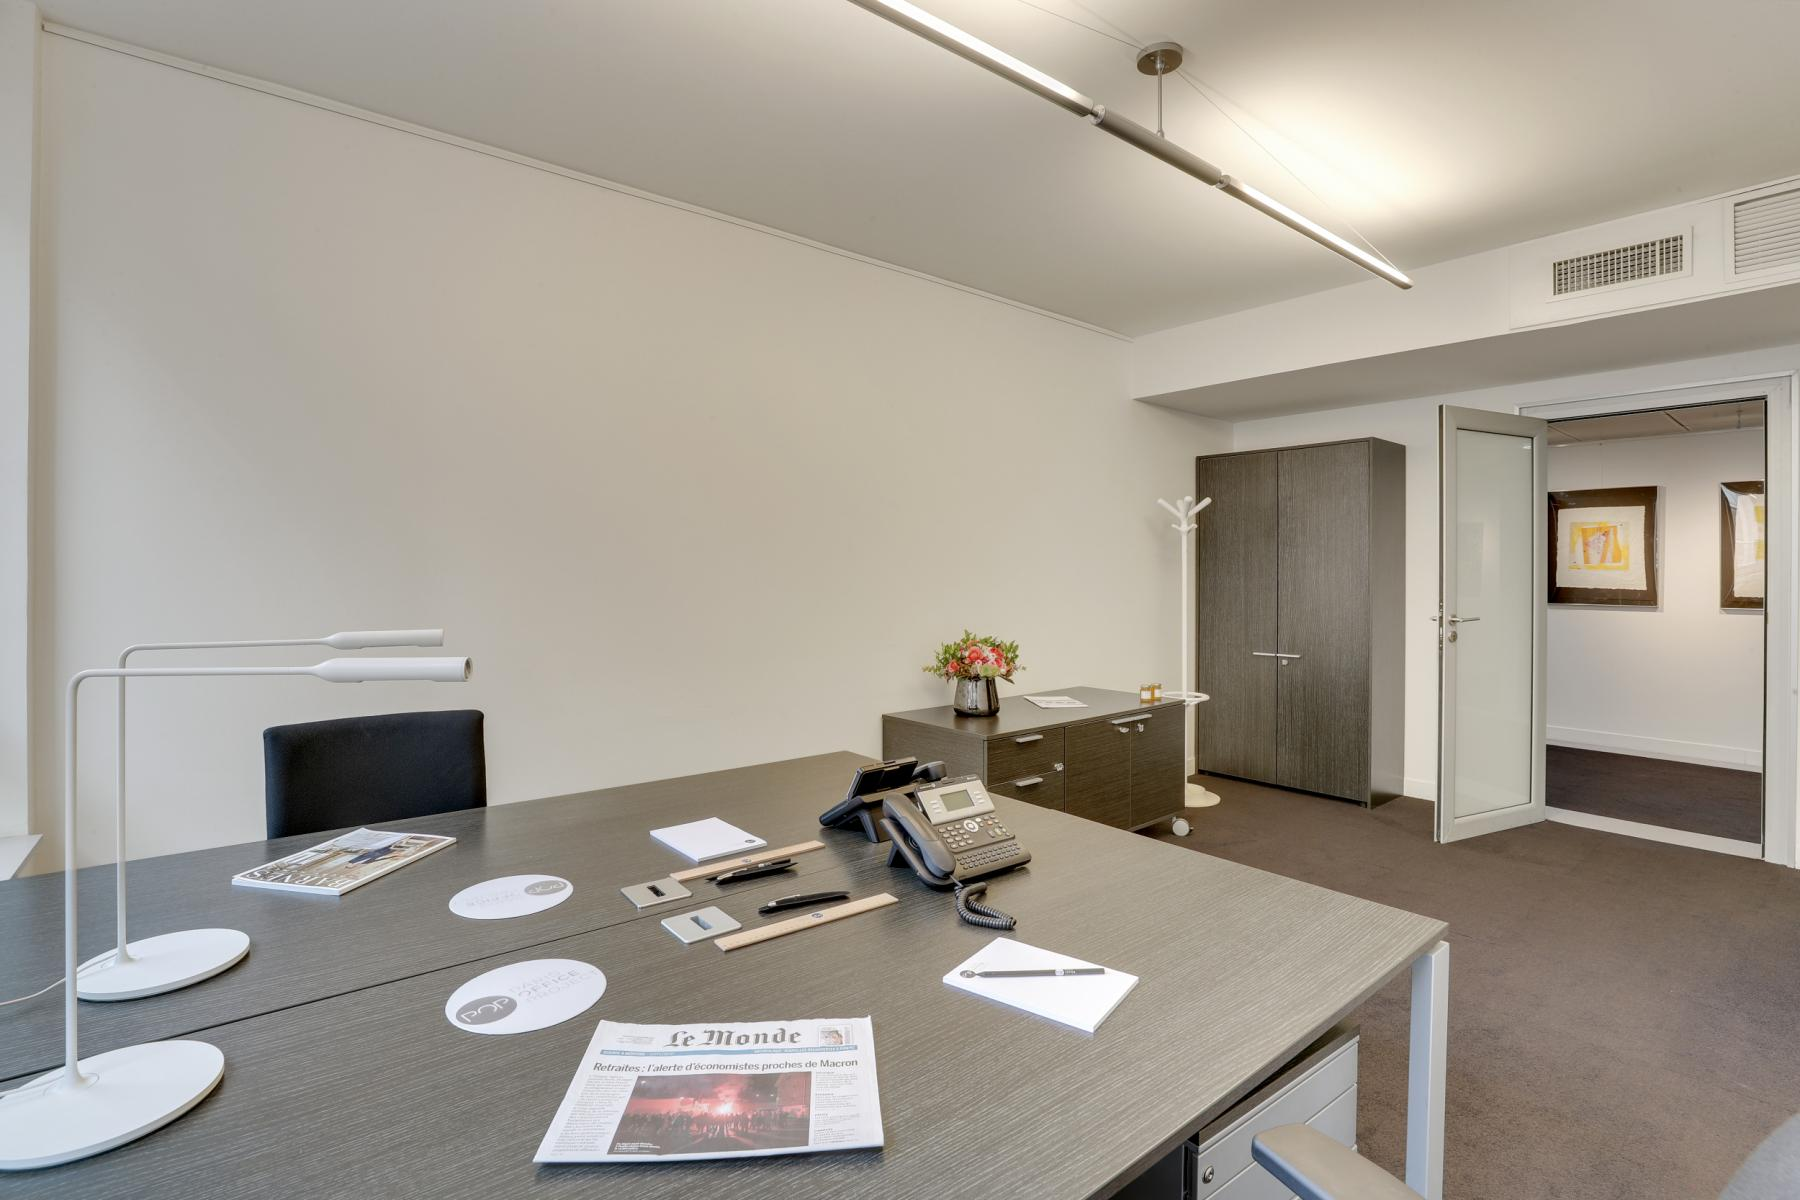 Location bureau Rue Quentin-Bauchart 20, Paris (8)